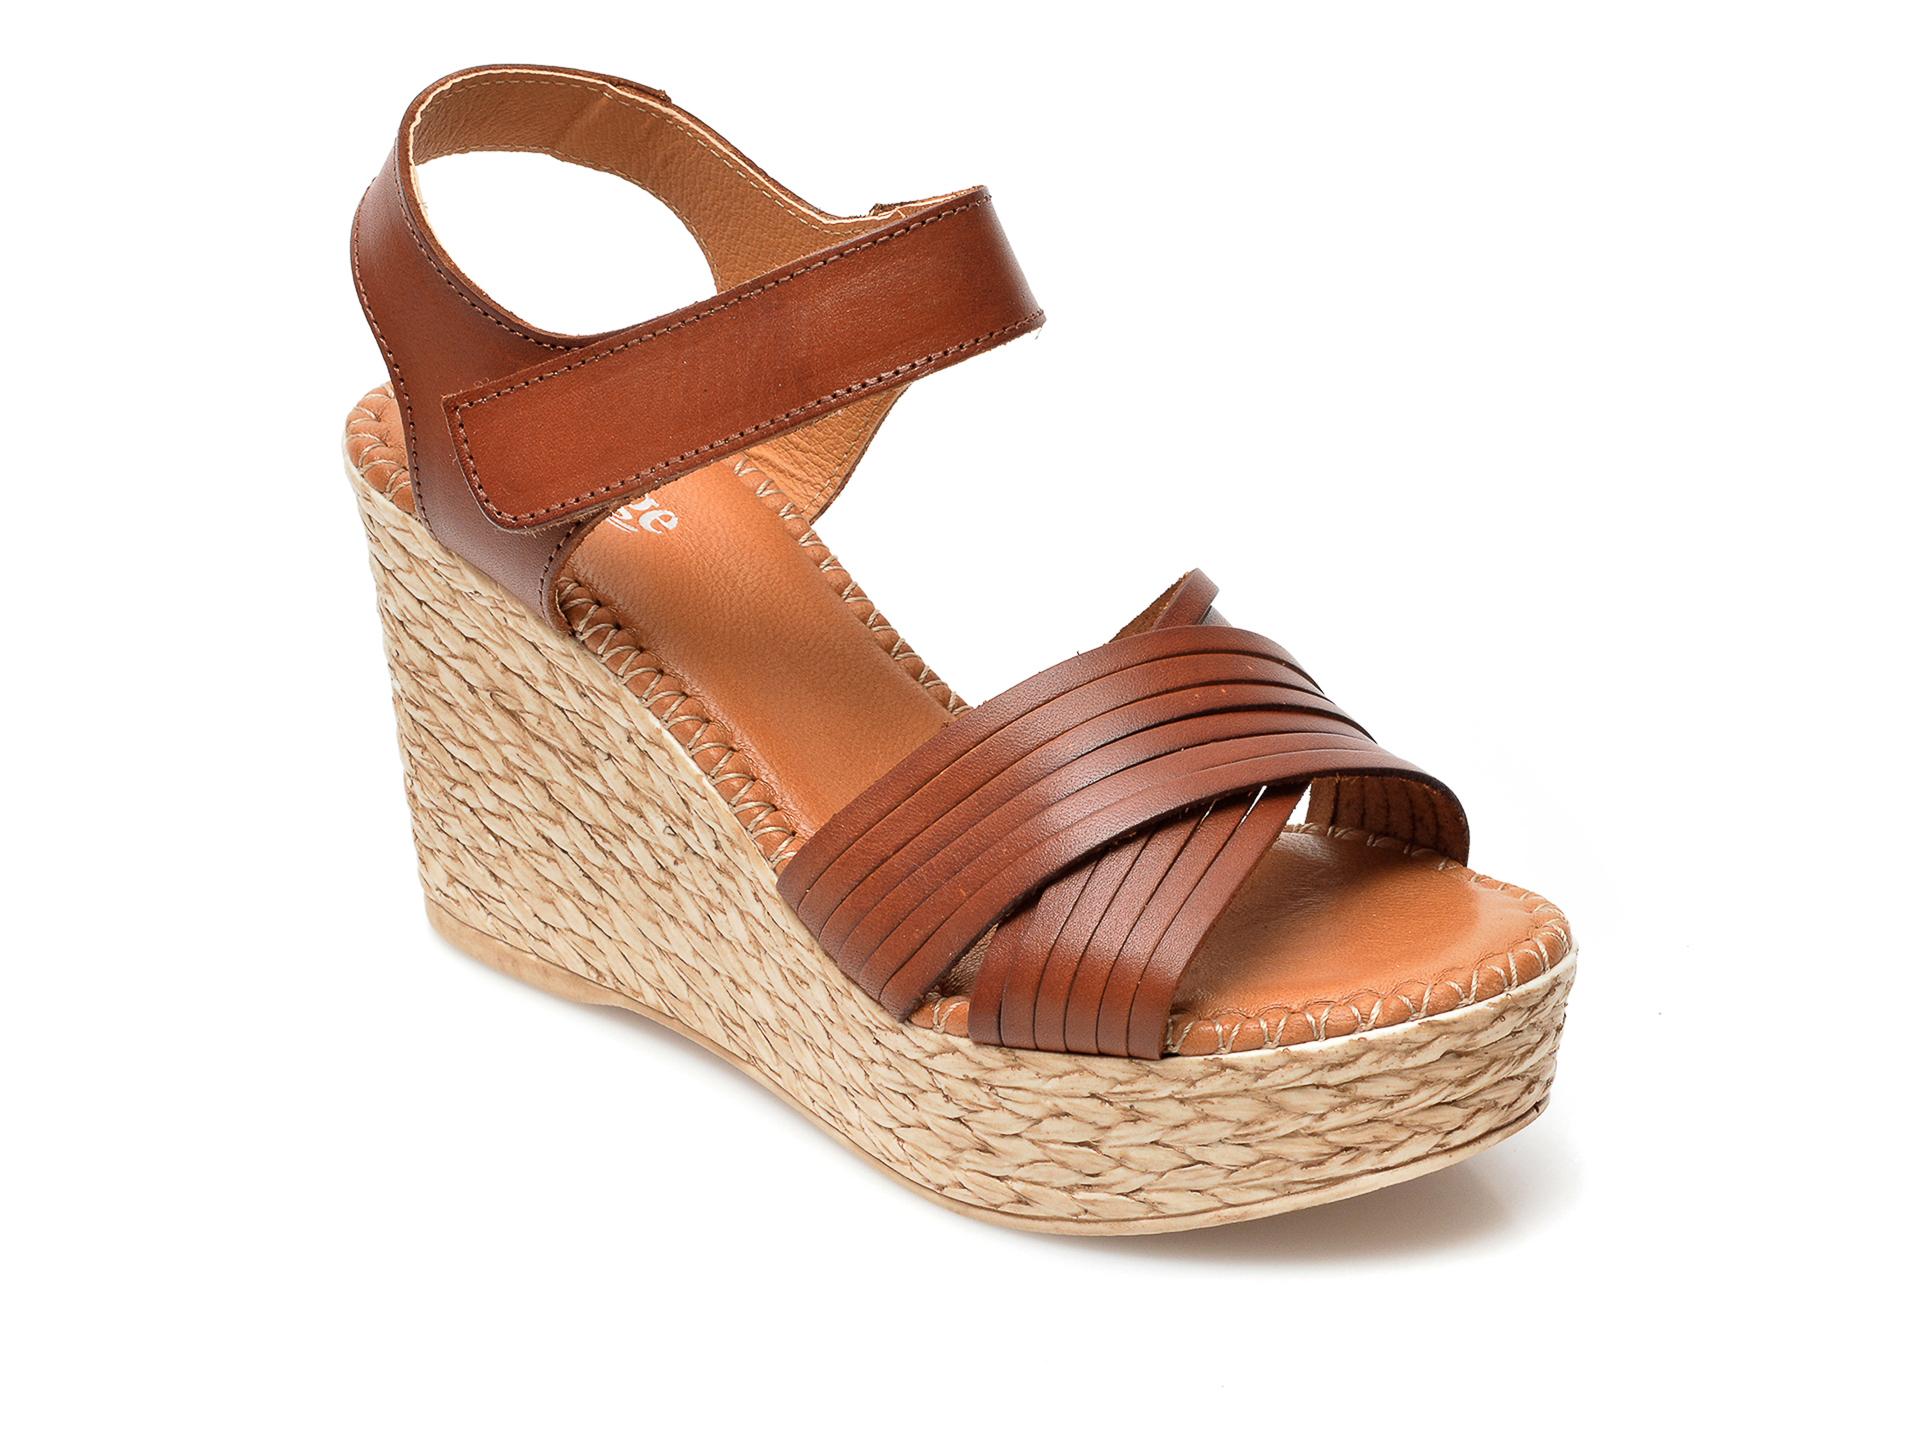 Sandale IMAGE maro, 1506, din piele naturala imagine otter.ro 2021